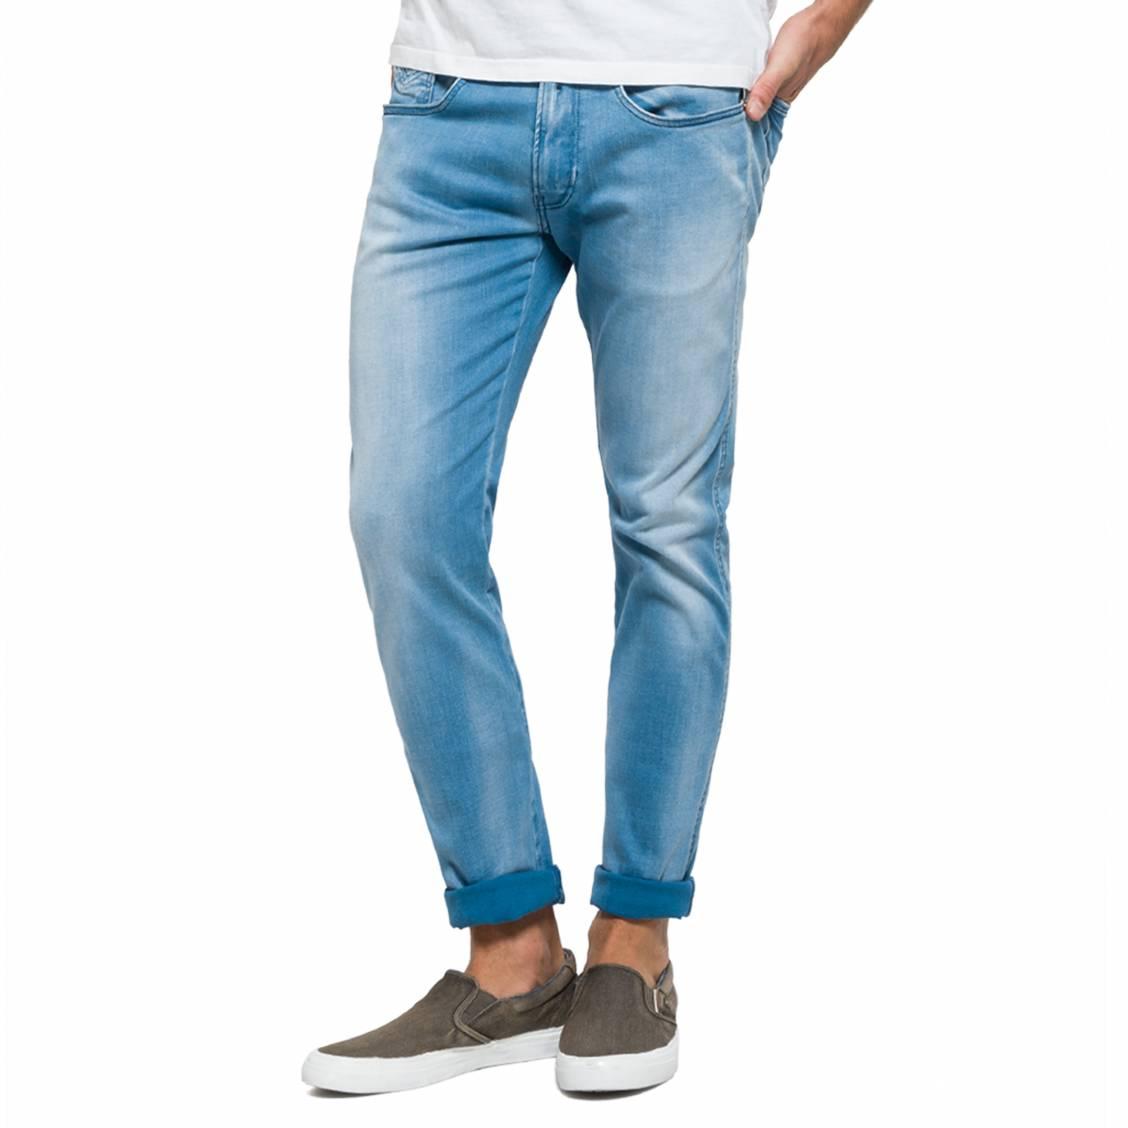 Jeans - Slim Femme - Turquoise - W29Replay cazT9Bk